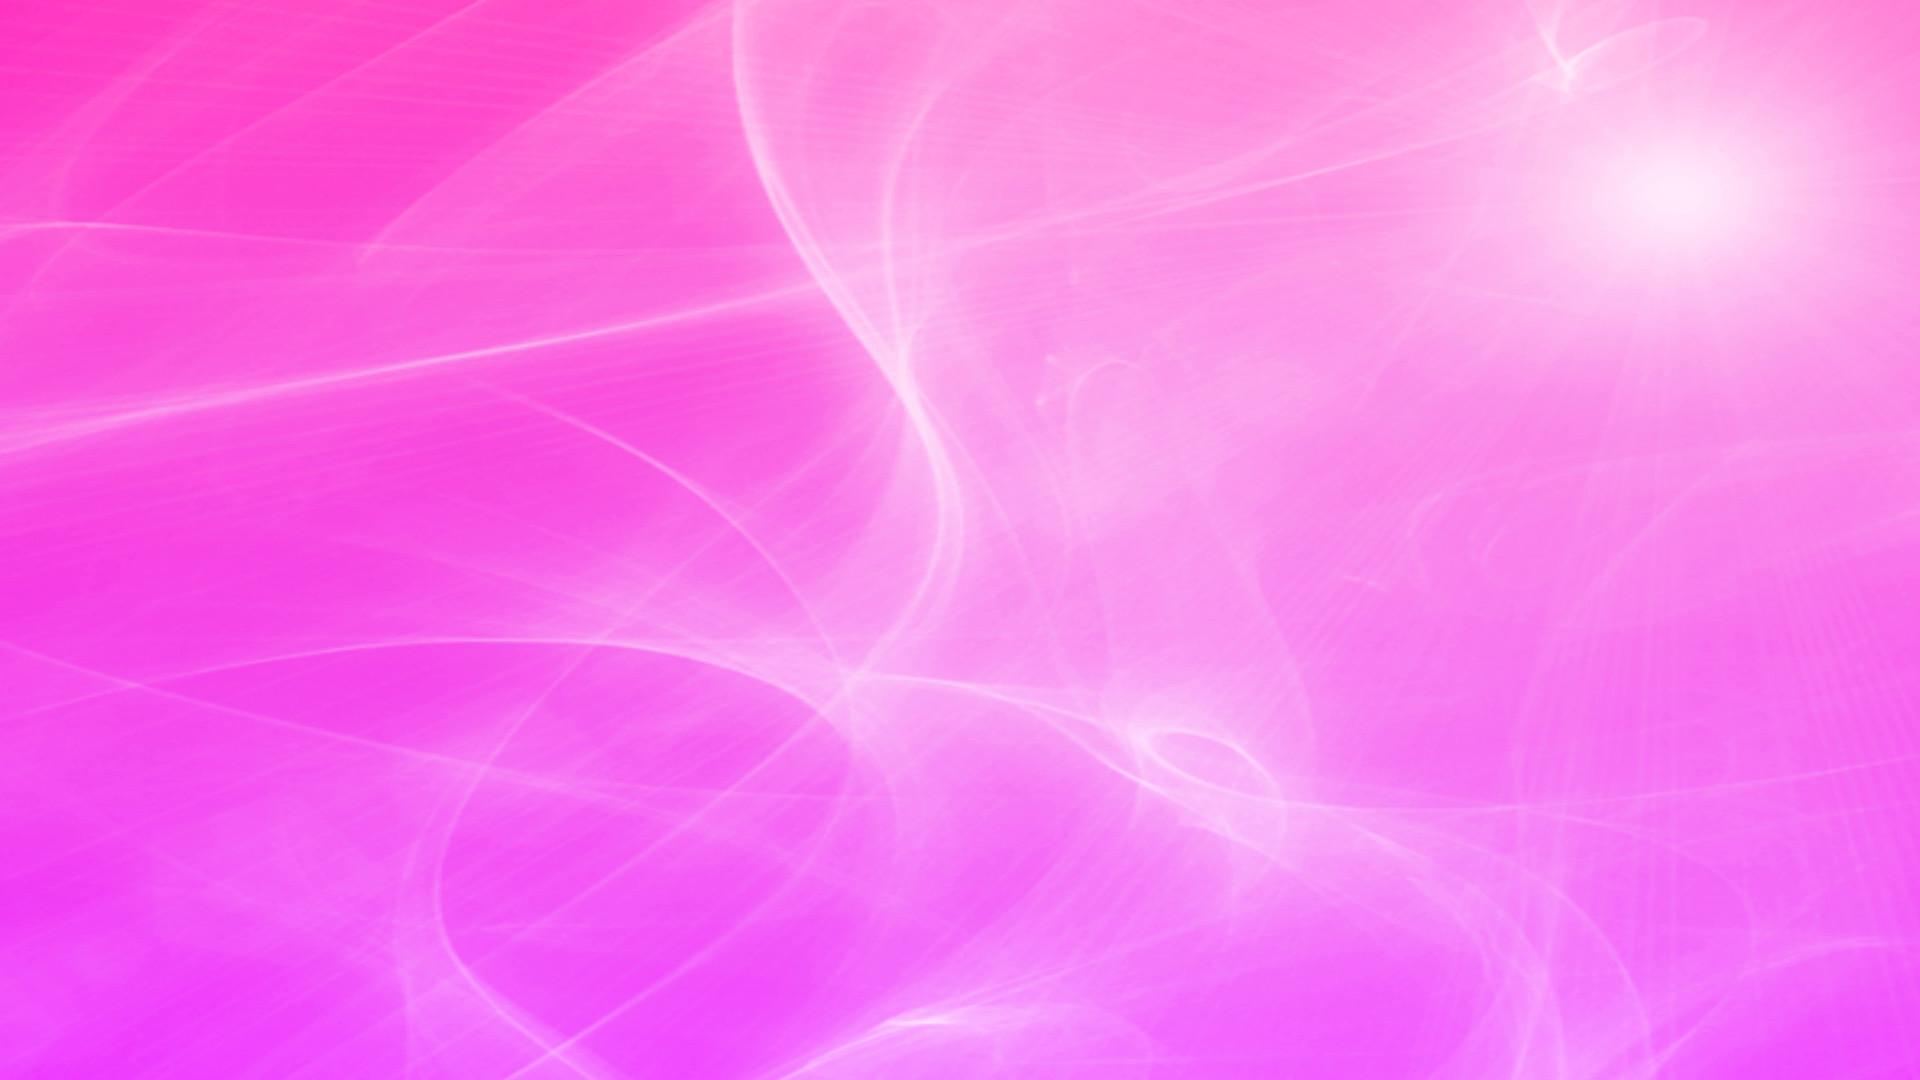 Solid Hot Pink Wallpaper